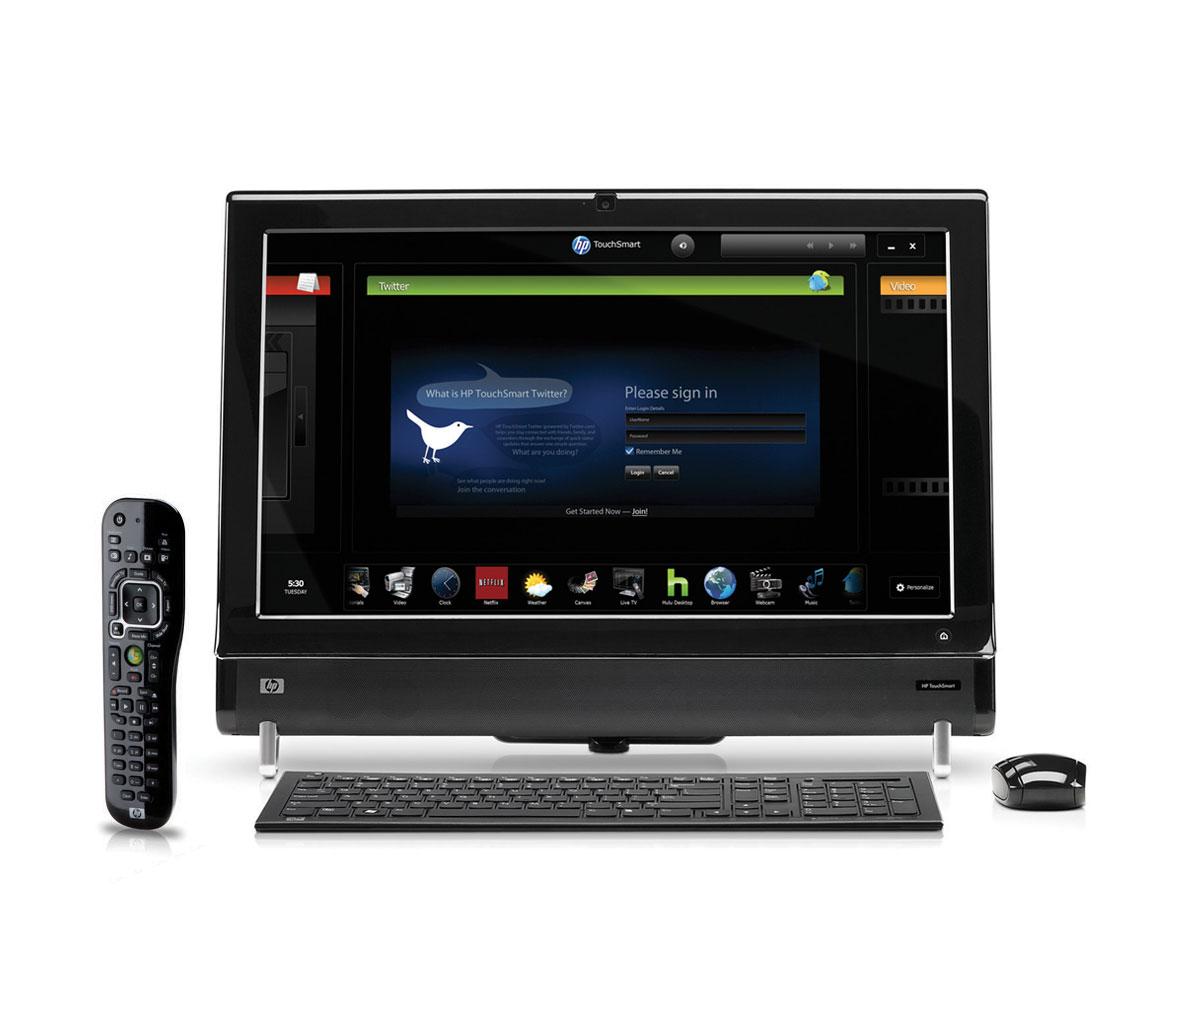 HP TouchSmart 600-1350 All-in-One Desktop PC